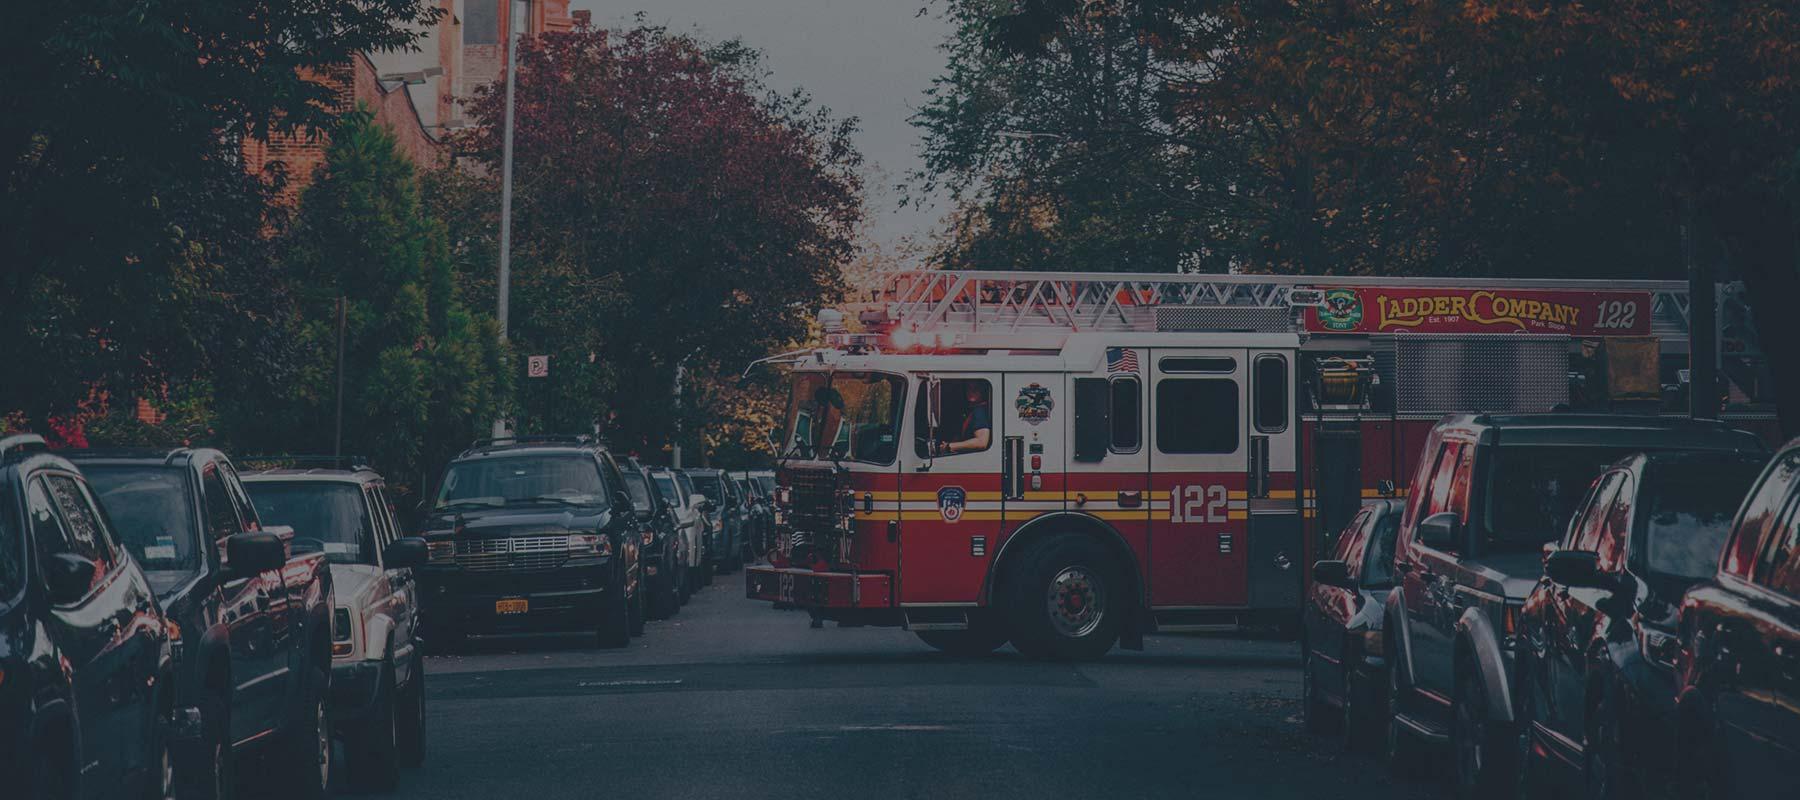 Adopting Analytics in Public Safety